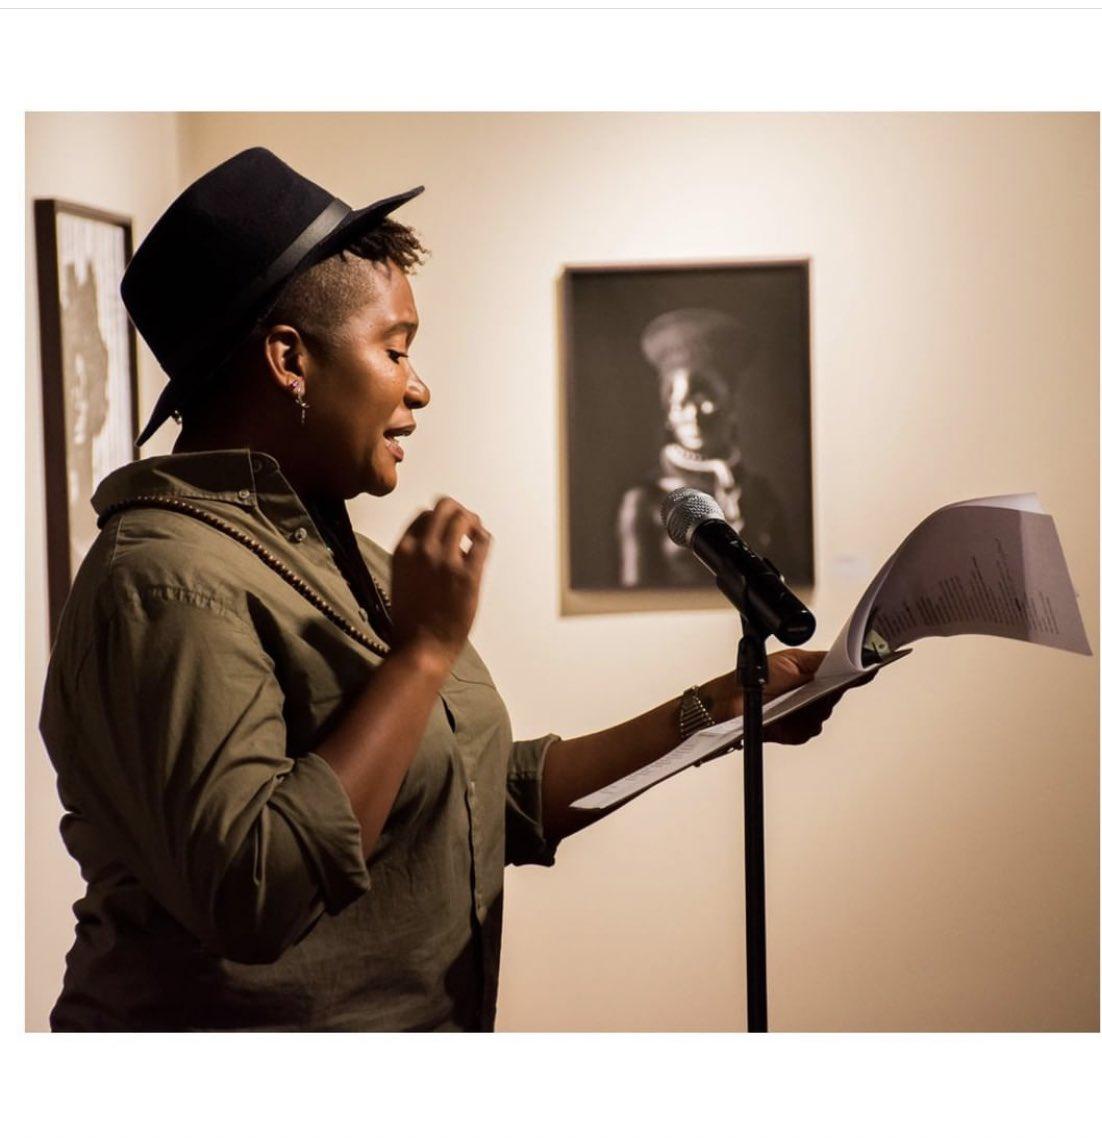 #tbt @autographabp  ・・・ Listen to @lyrispect's original poem The Reclamation - in response to our exhibition Zanele Muholi: Somnyama Ngonyama, Hail the Dark Lioness which debuted at #SpelZanelePRIDE.  Listen at https://t.co/xSyBfDQhe0 https://t.co/FrUDKguVIz